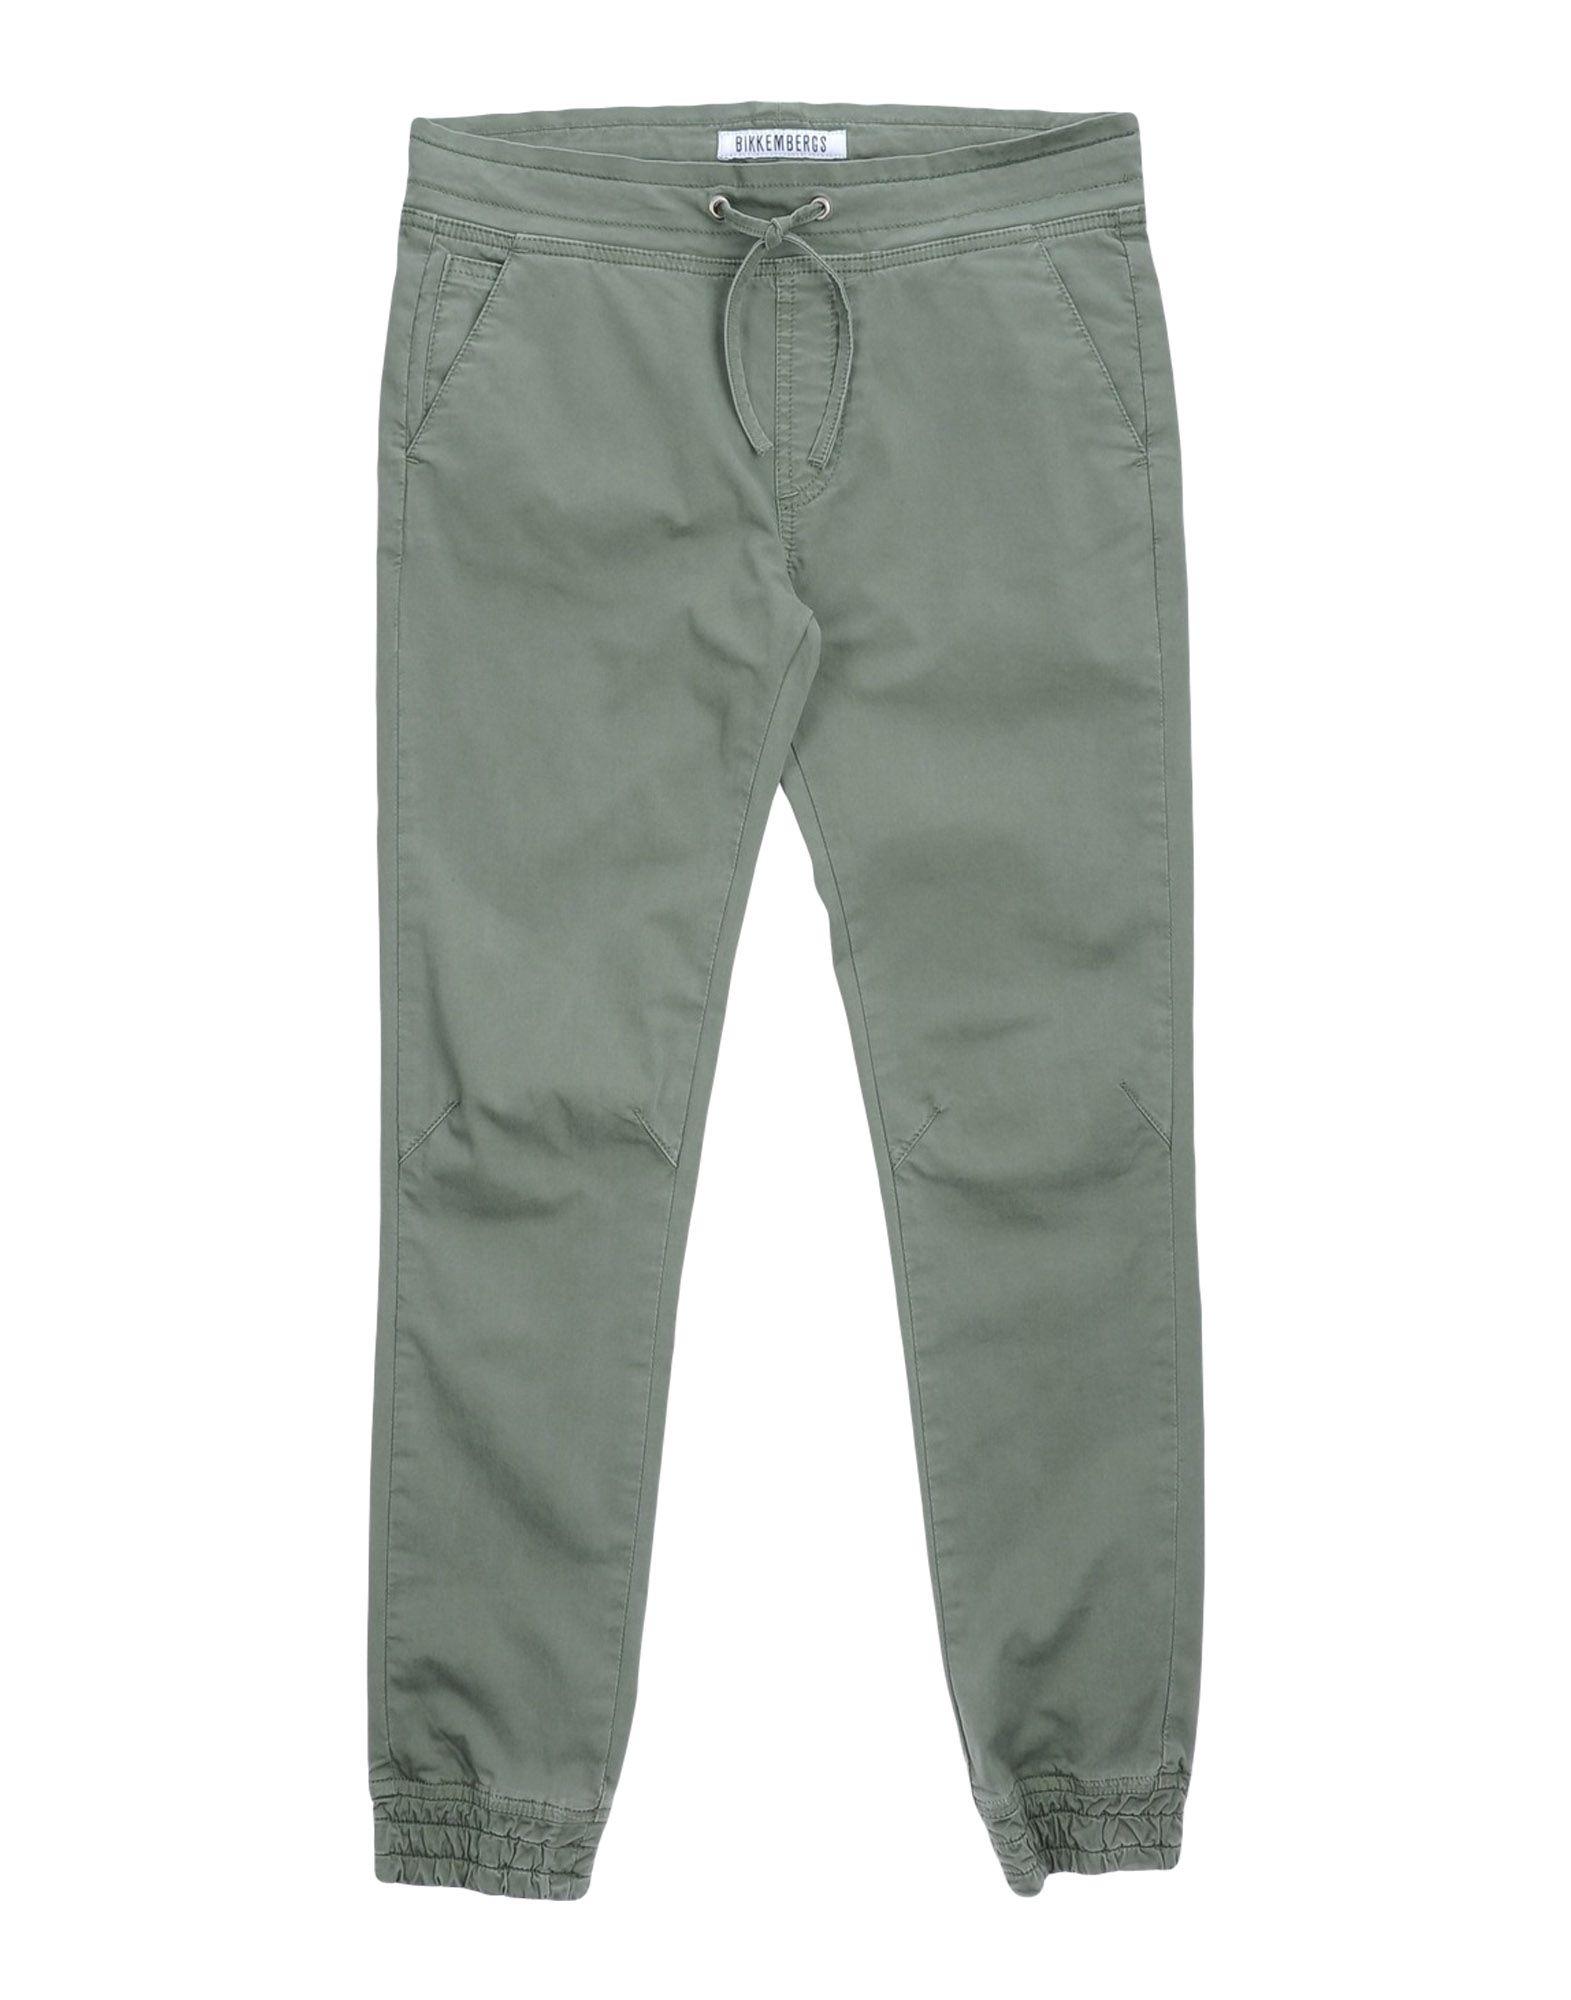 BIKKEMBERGS Повседневные брюки брюки bikkembergs c q 62b fj s b099 e61